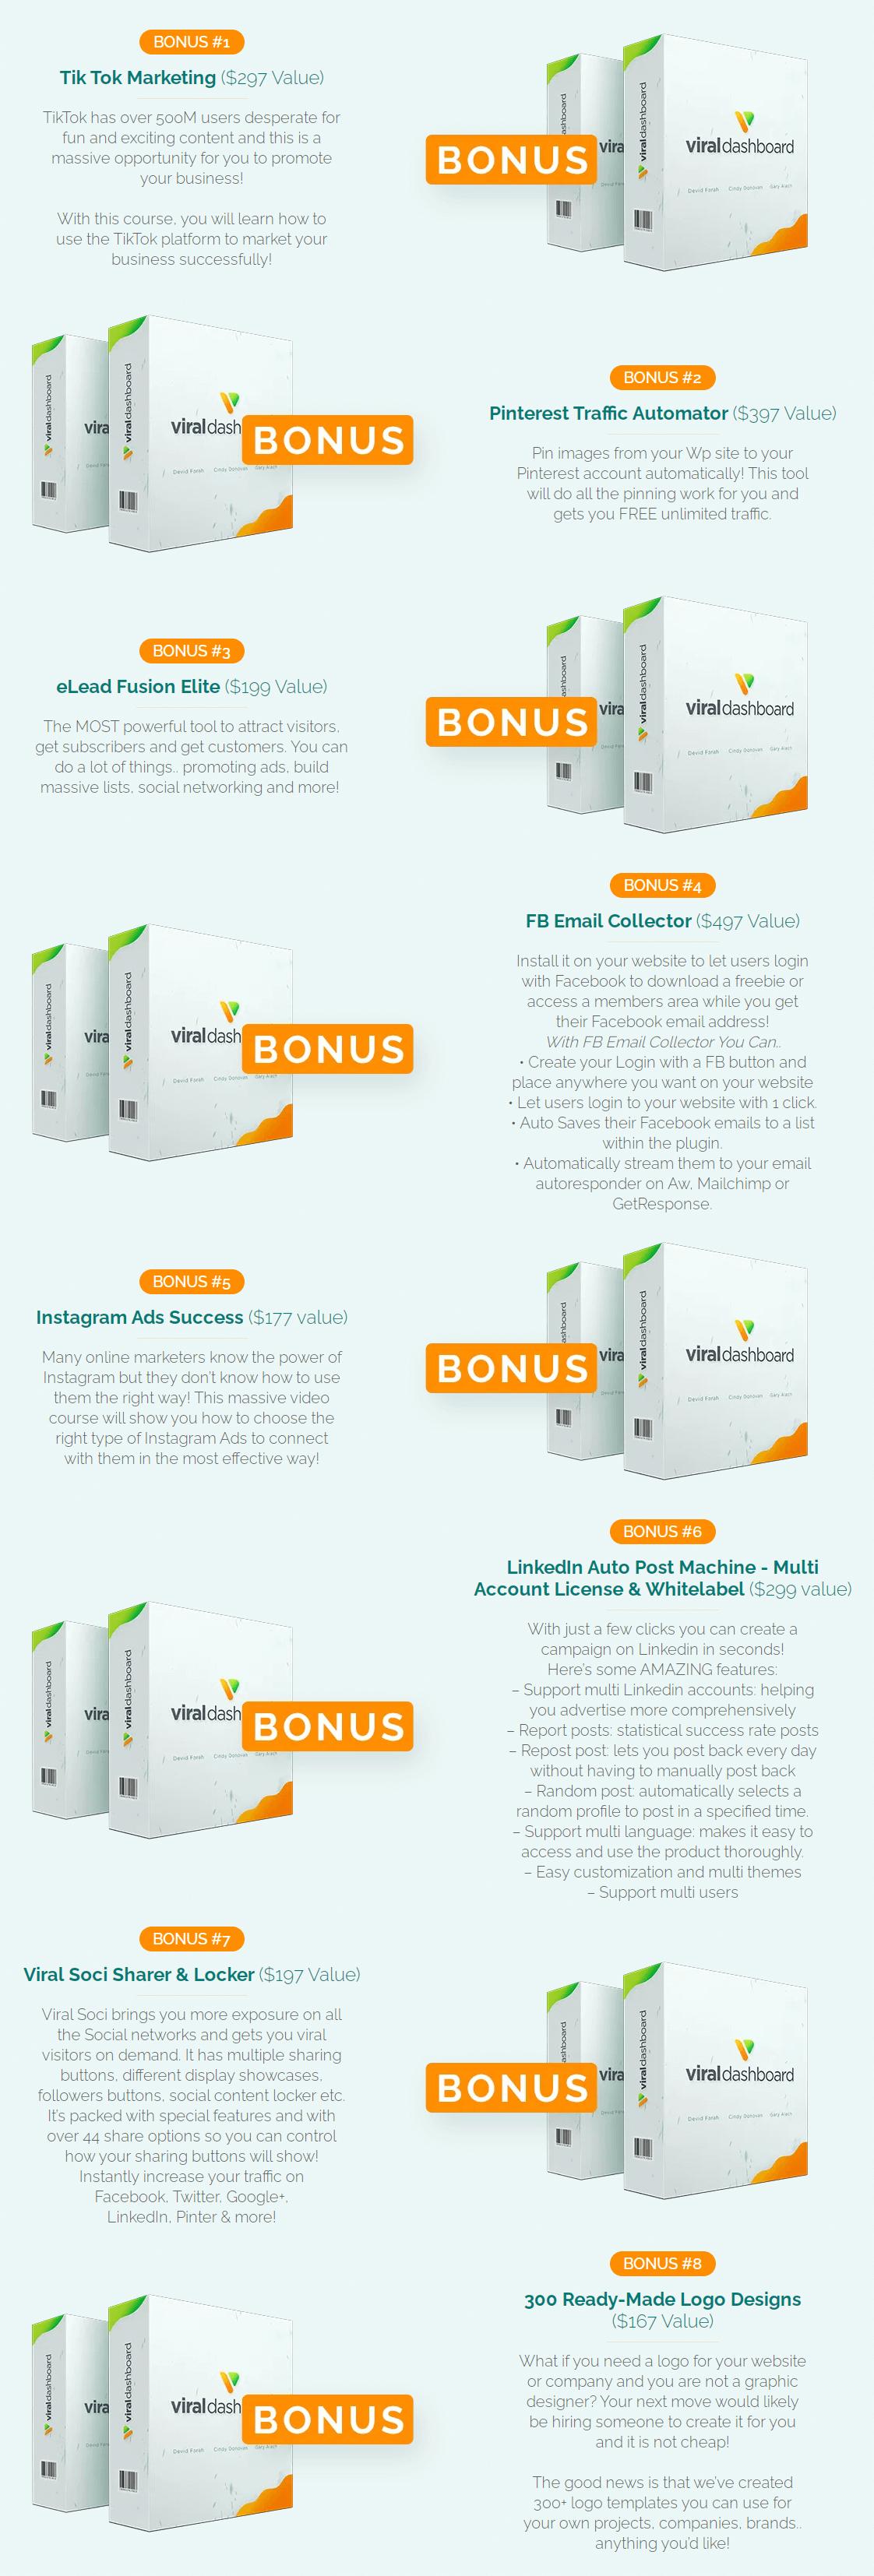 ViralDashboard-bonus